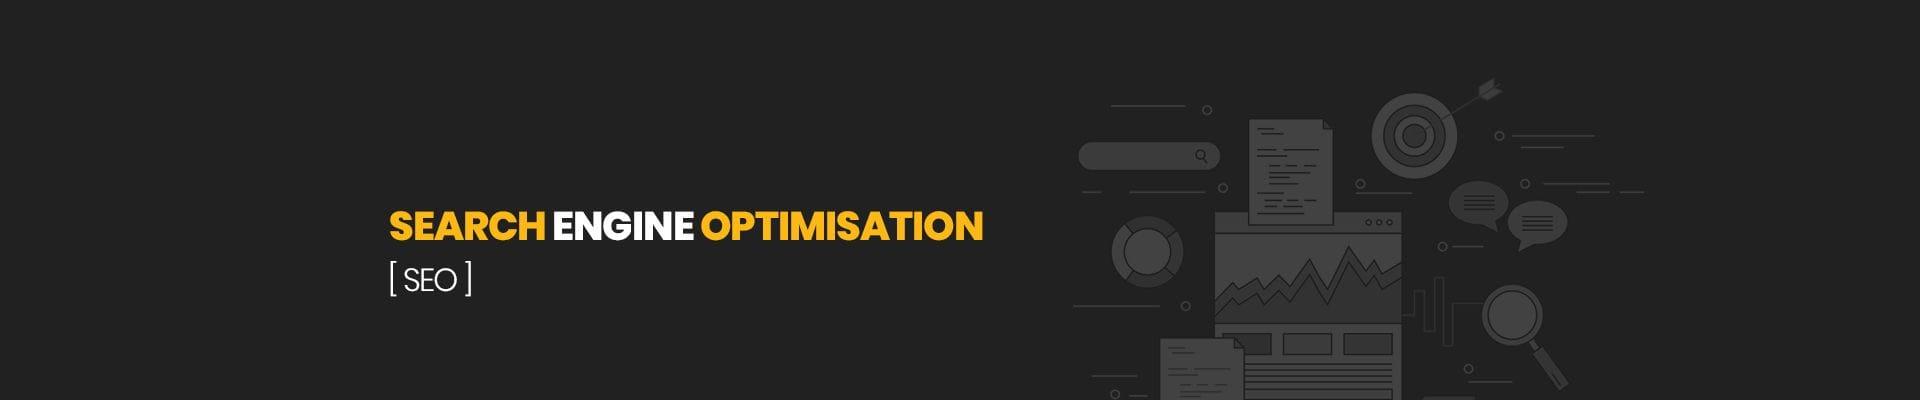 Search Engine Optimisation | SEO Services | Bloomtools